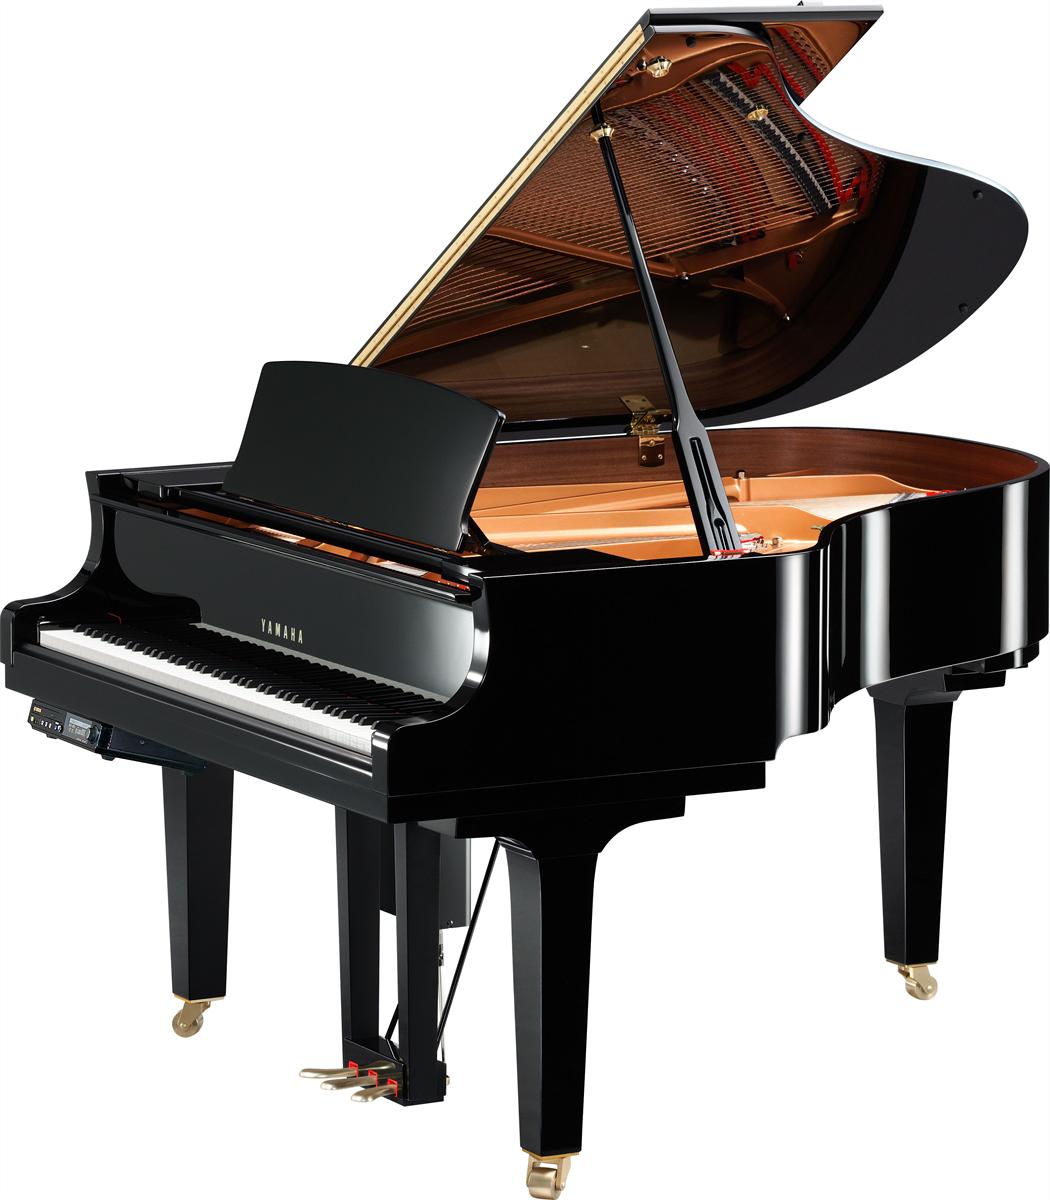 Yamaha DC2X ENSPIRE Disklavier™ Grand Piano